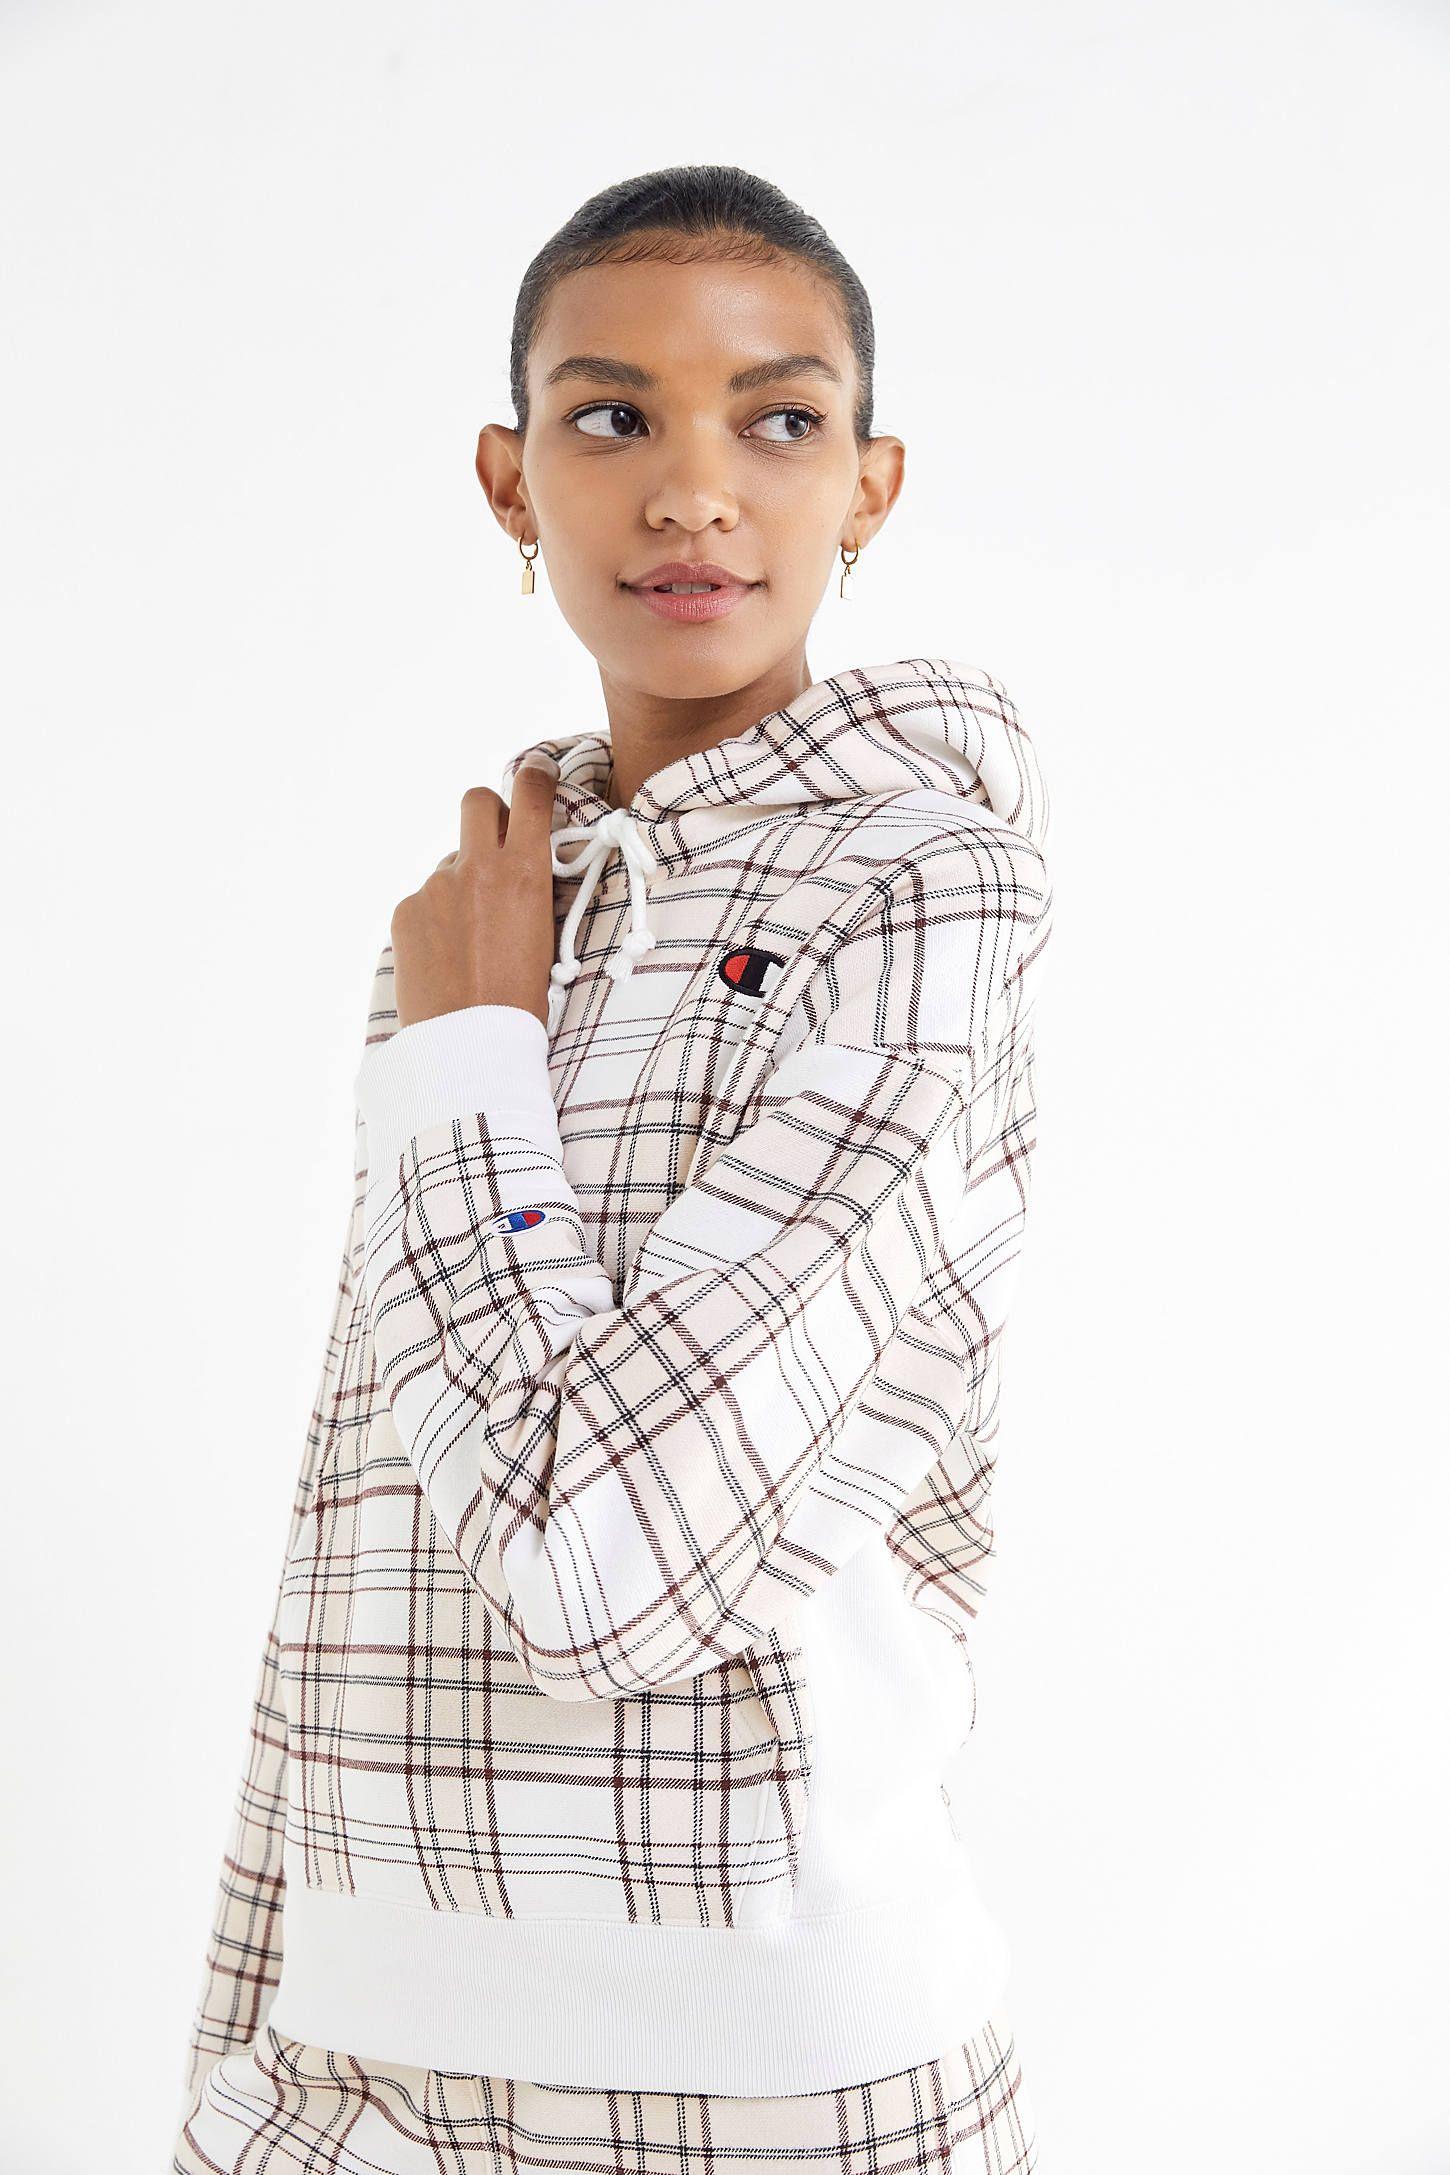 da4ccb7f5 Champion UO Exclusive Plaid Hoodie Sweatshirt